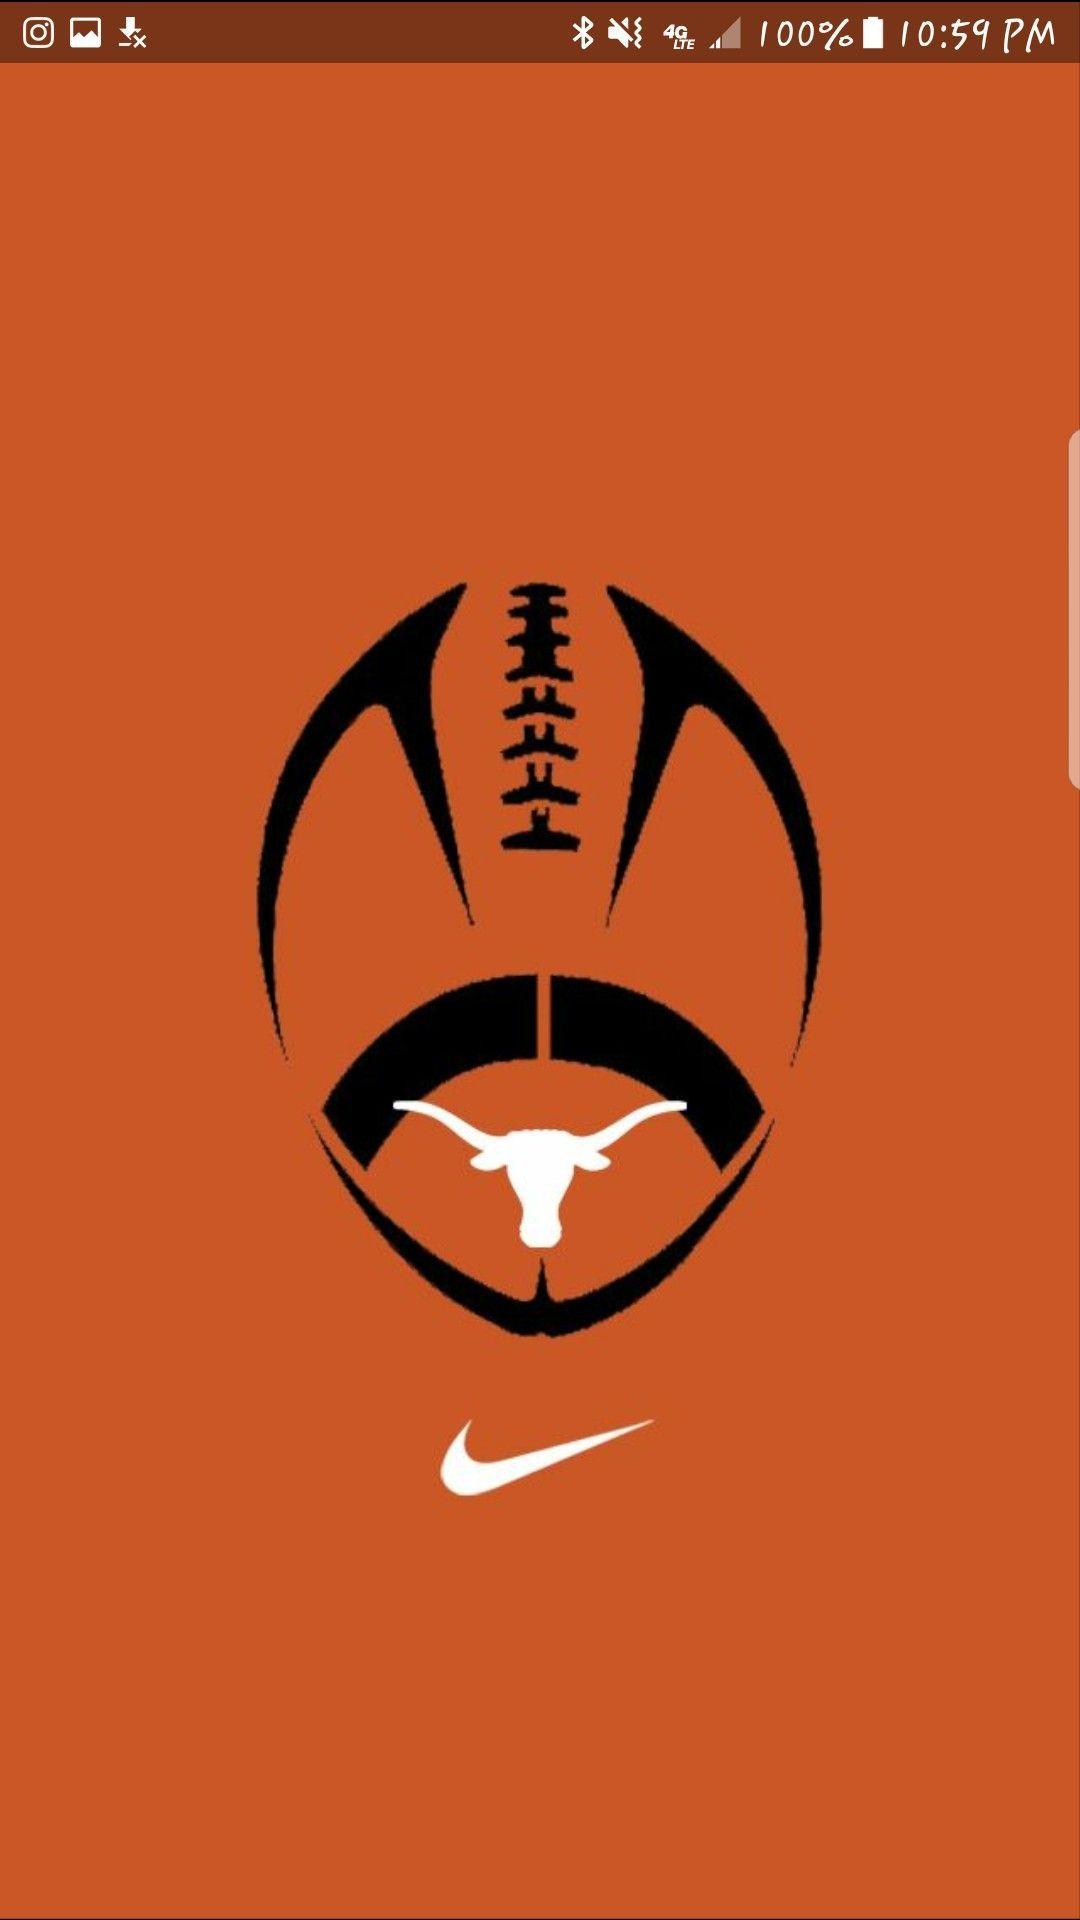 Nfl Sick Football In 2020 Texas Longhorns Football Texas Longhorns Logo Longhorns Football